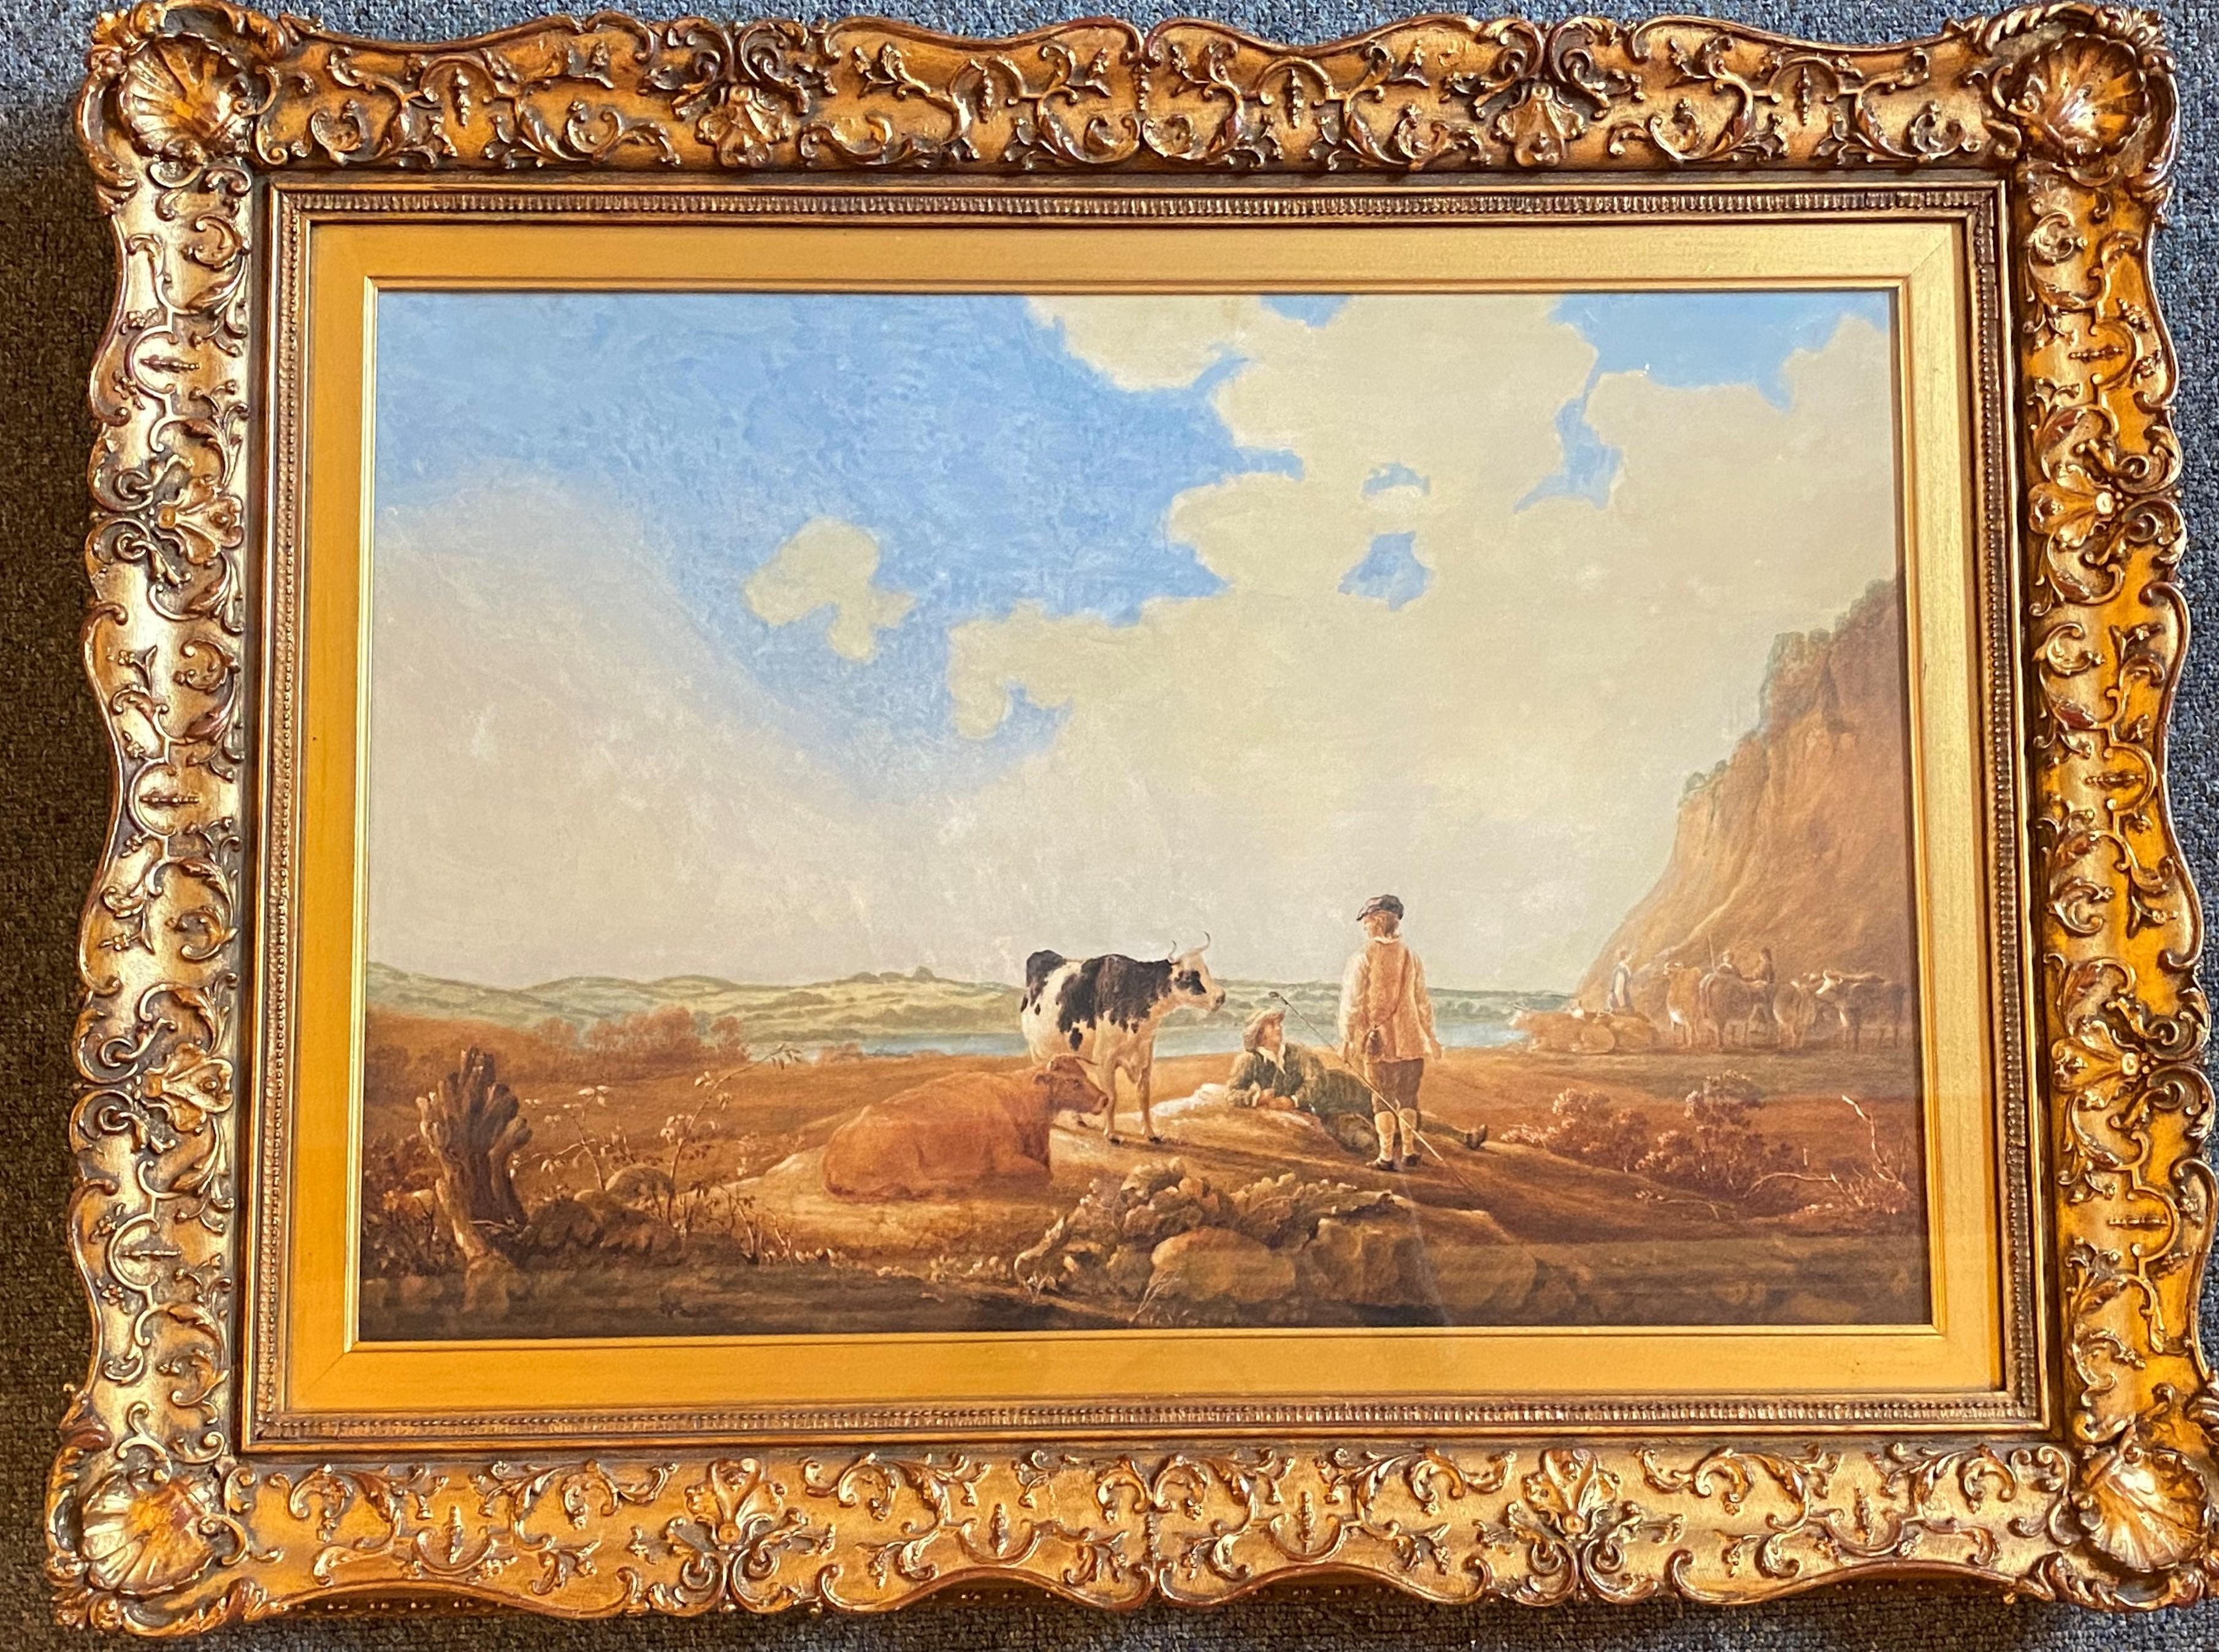 Attrib John Dearman (fl. 1824-56) British, original watercolour painting - Image 2 of 4